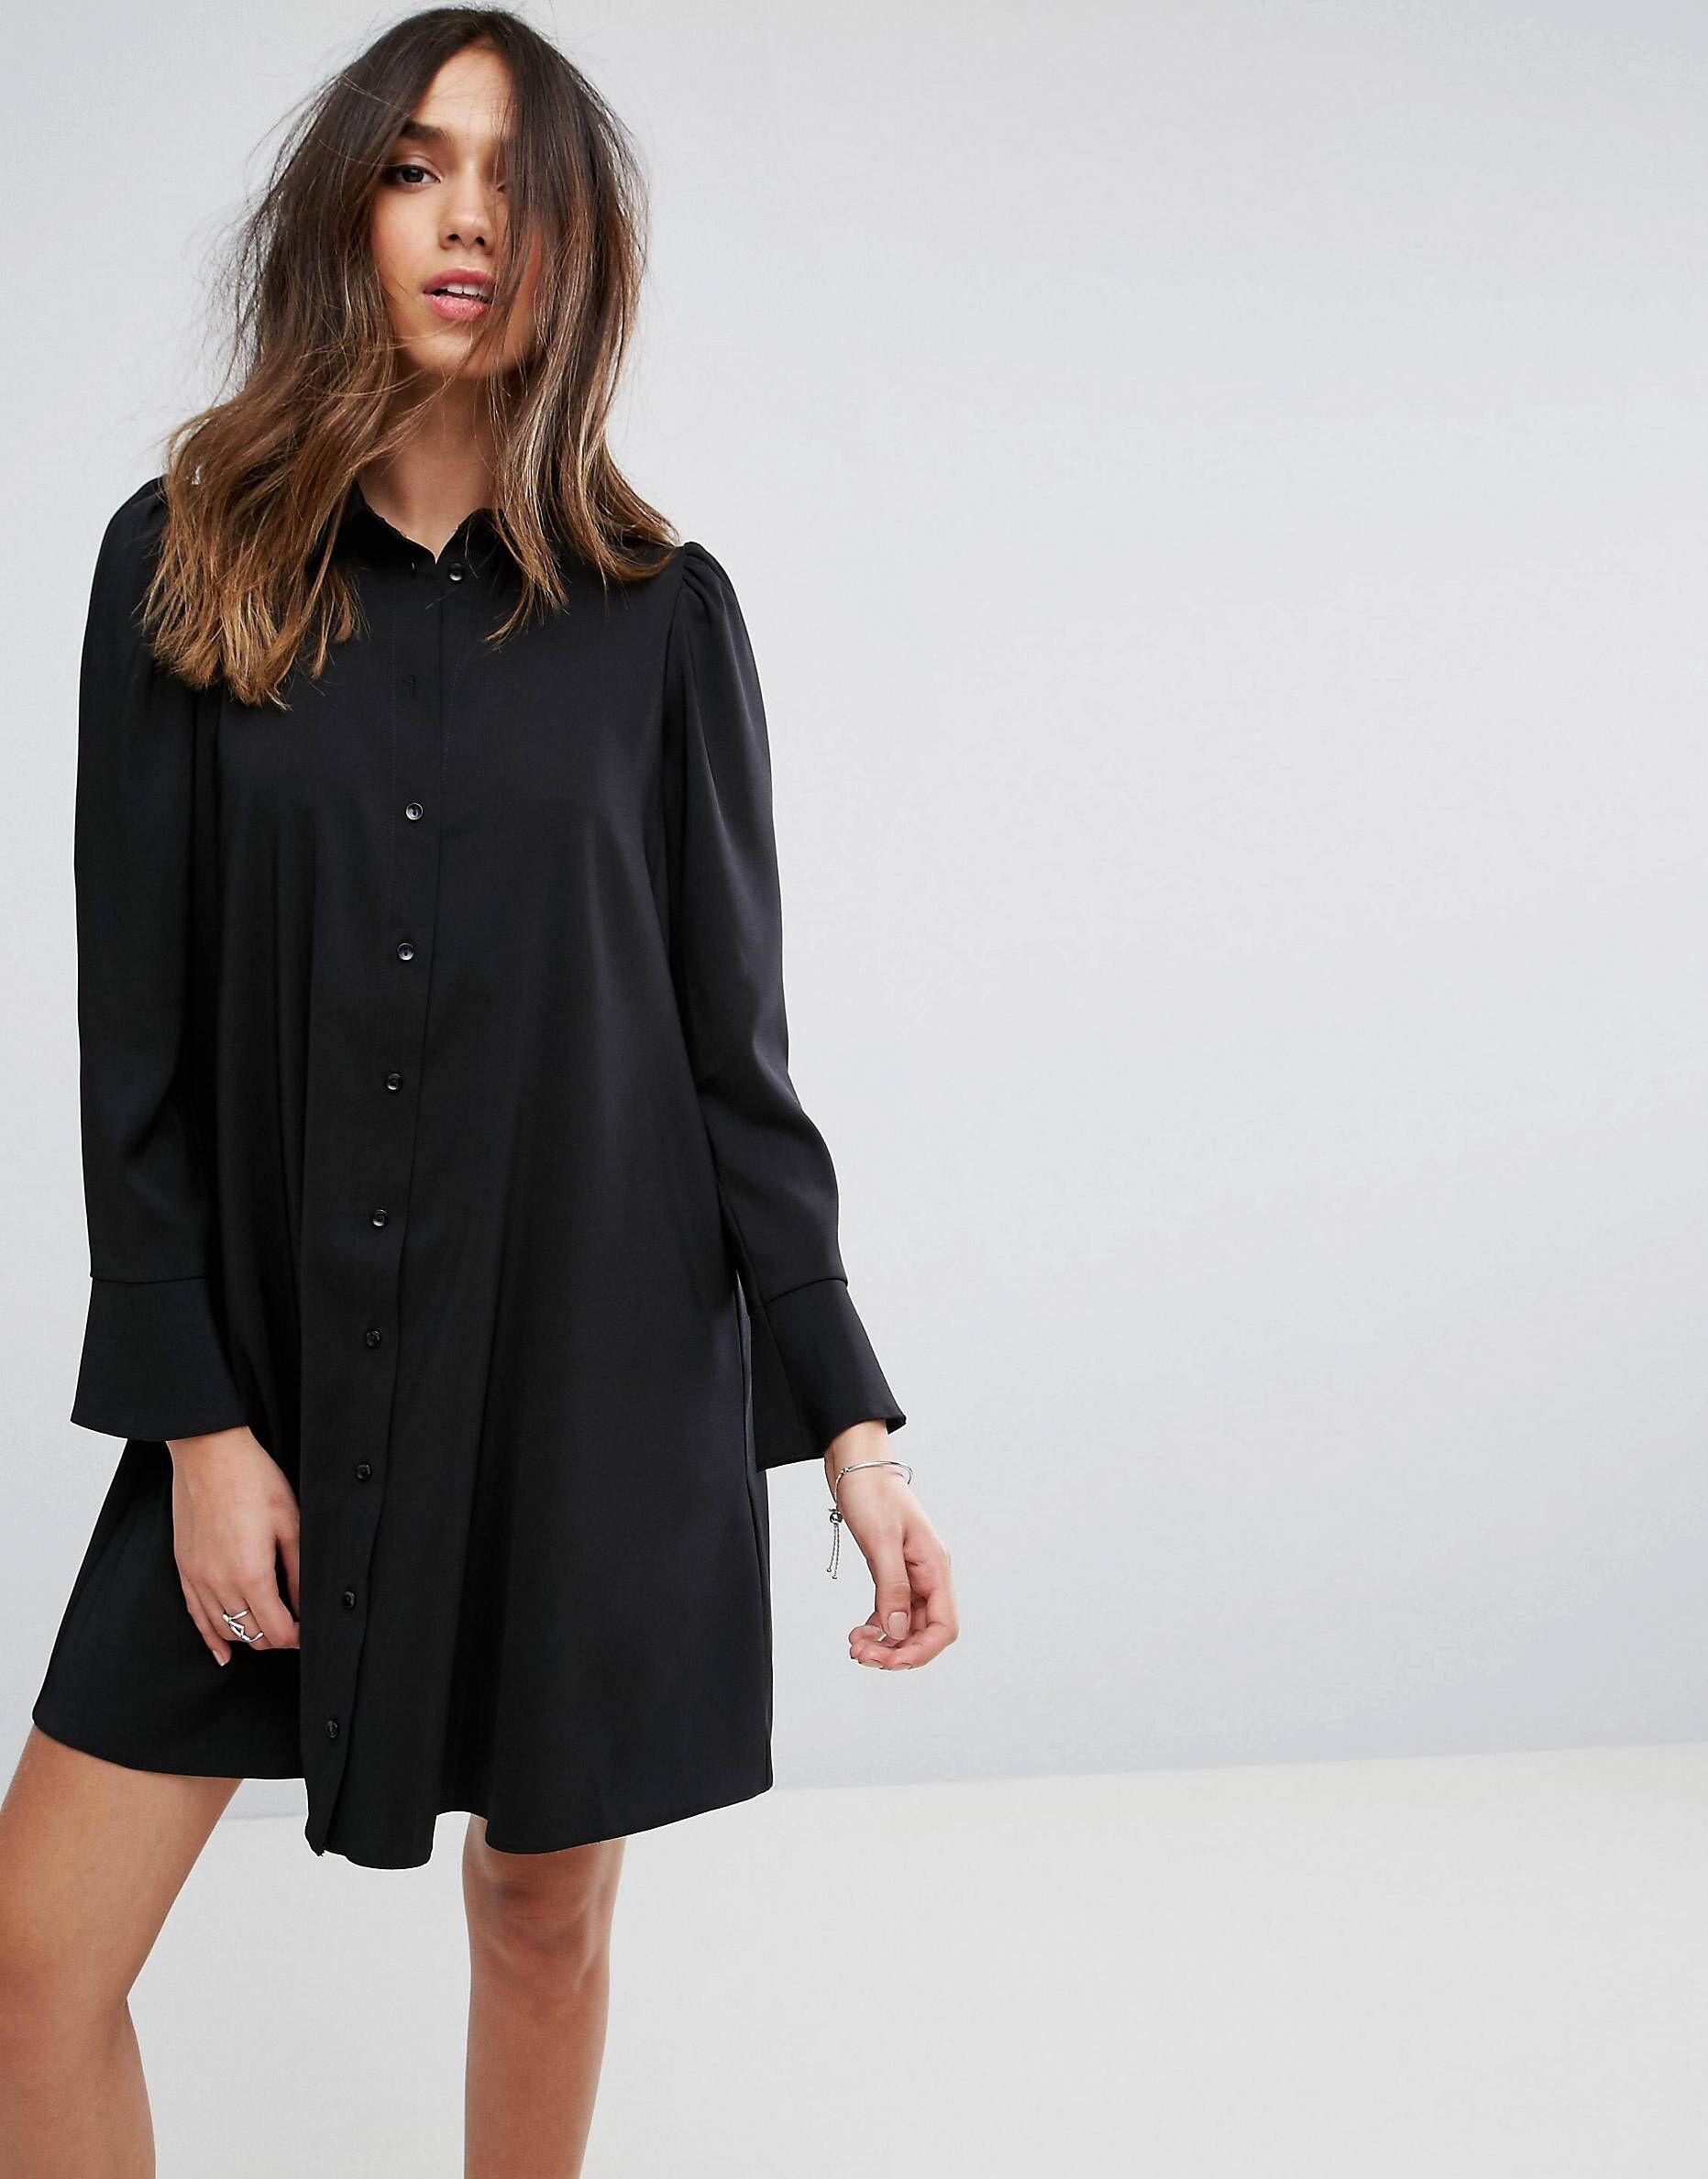 40++ Asos black shirt dress ideas in 2021